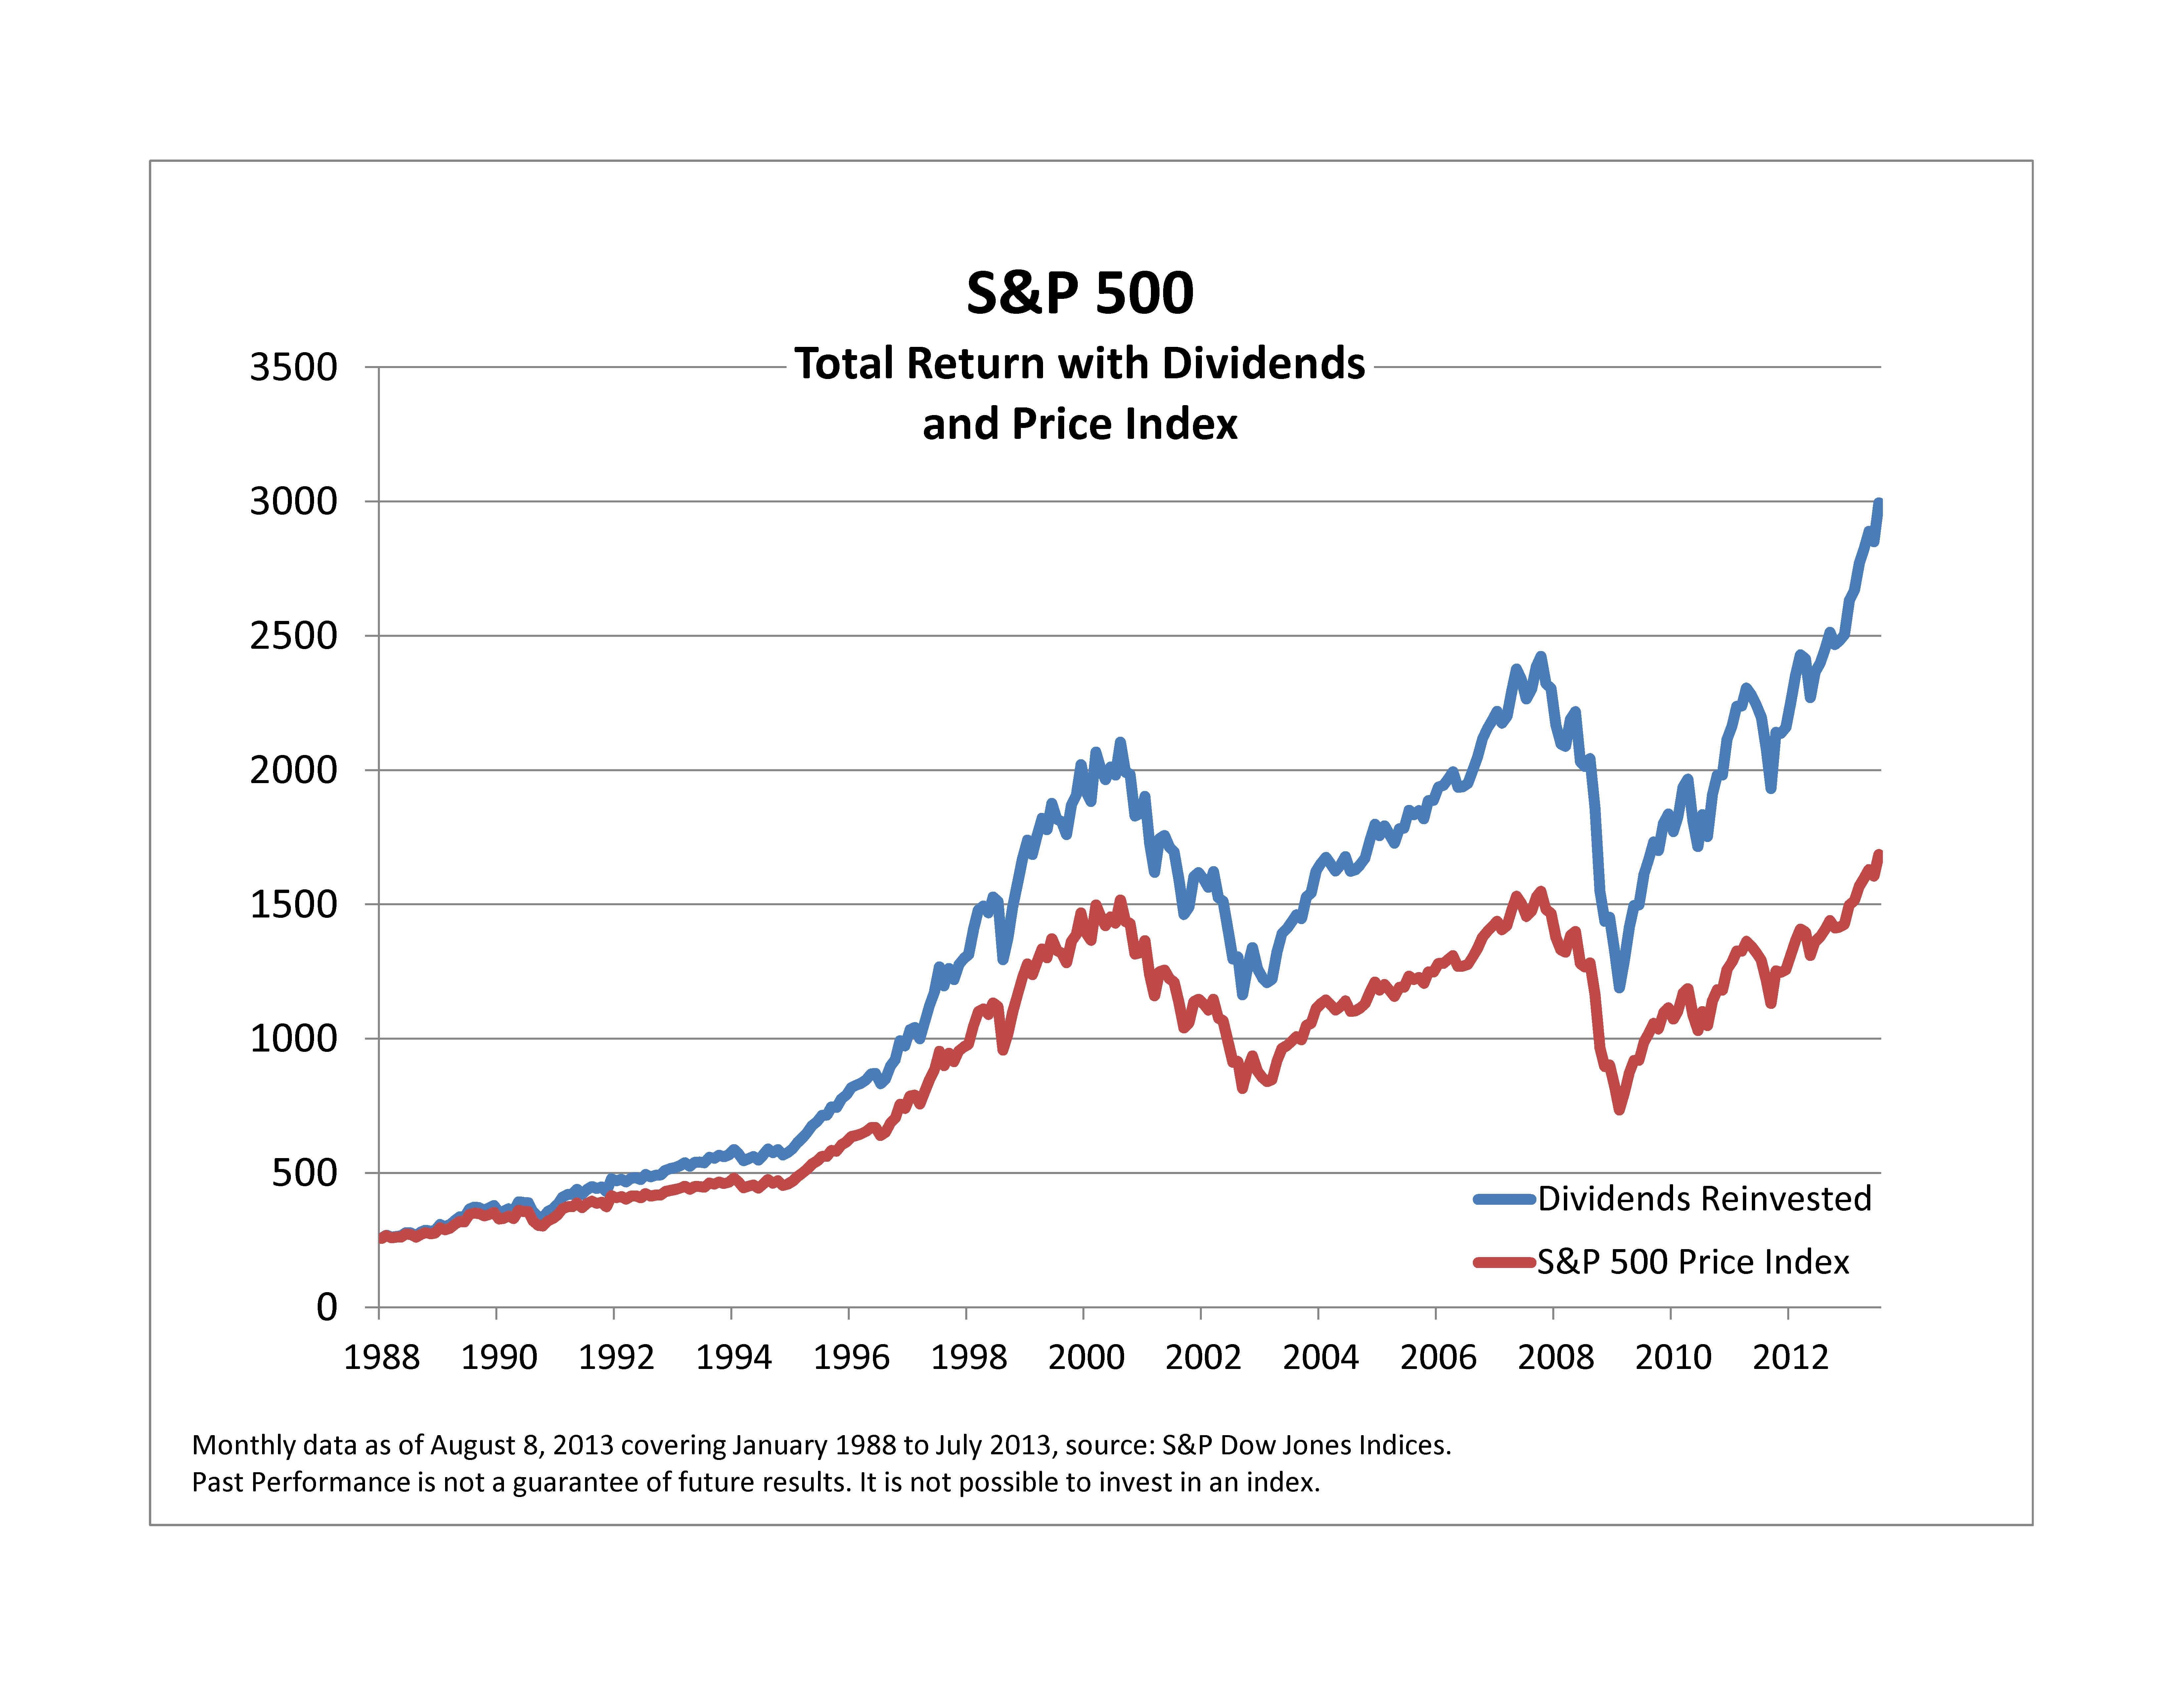 Reinversion de dividendos